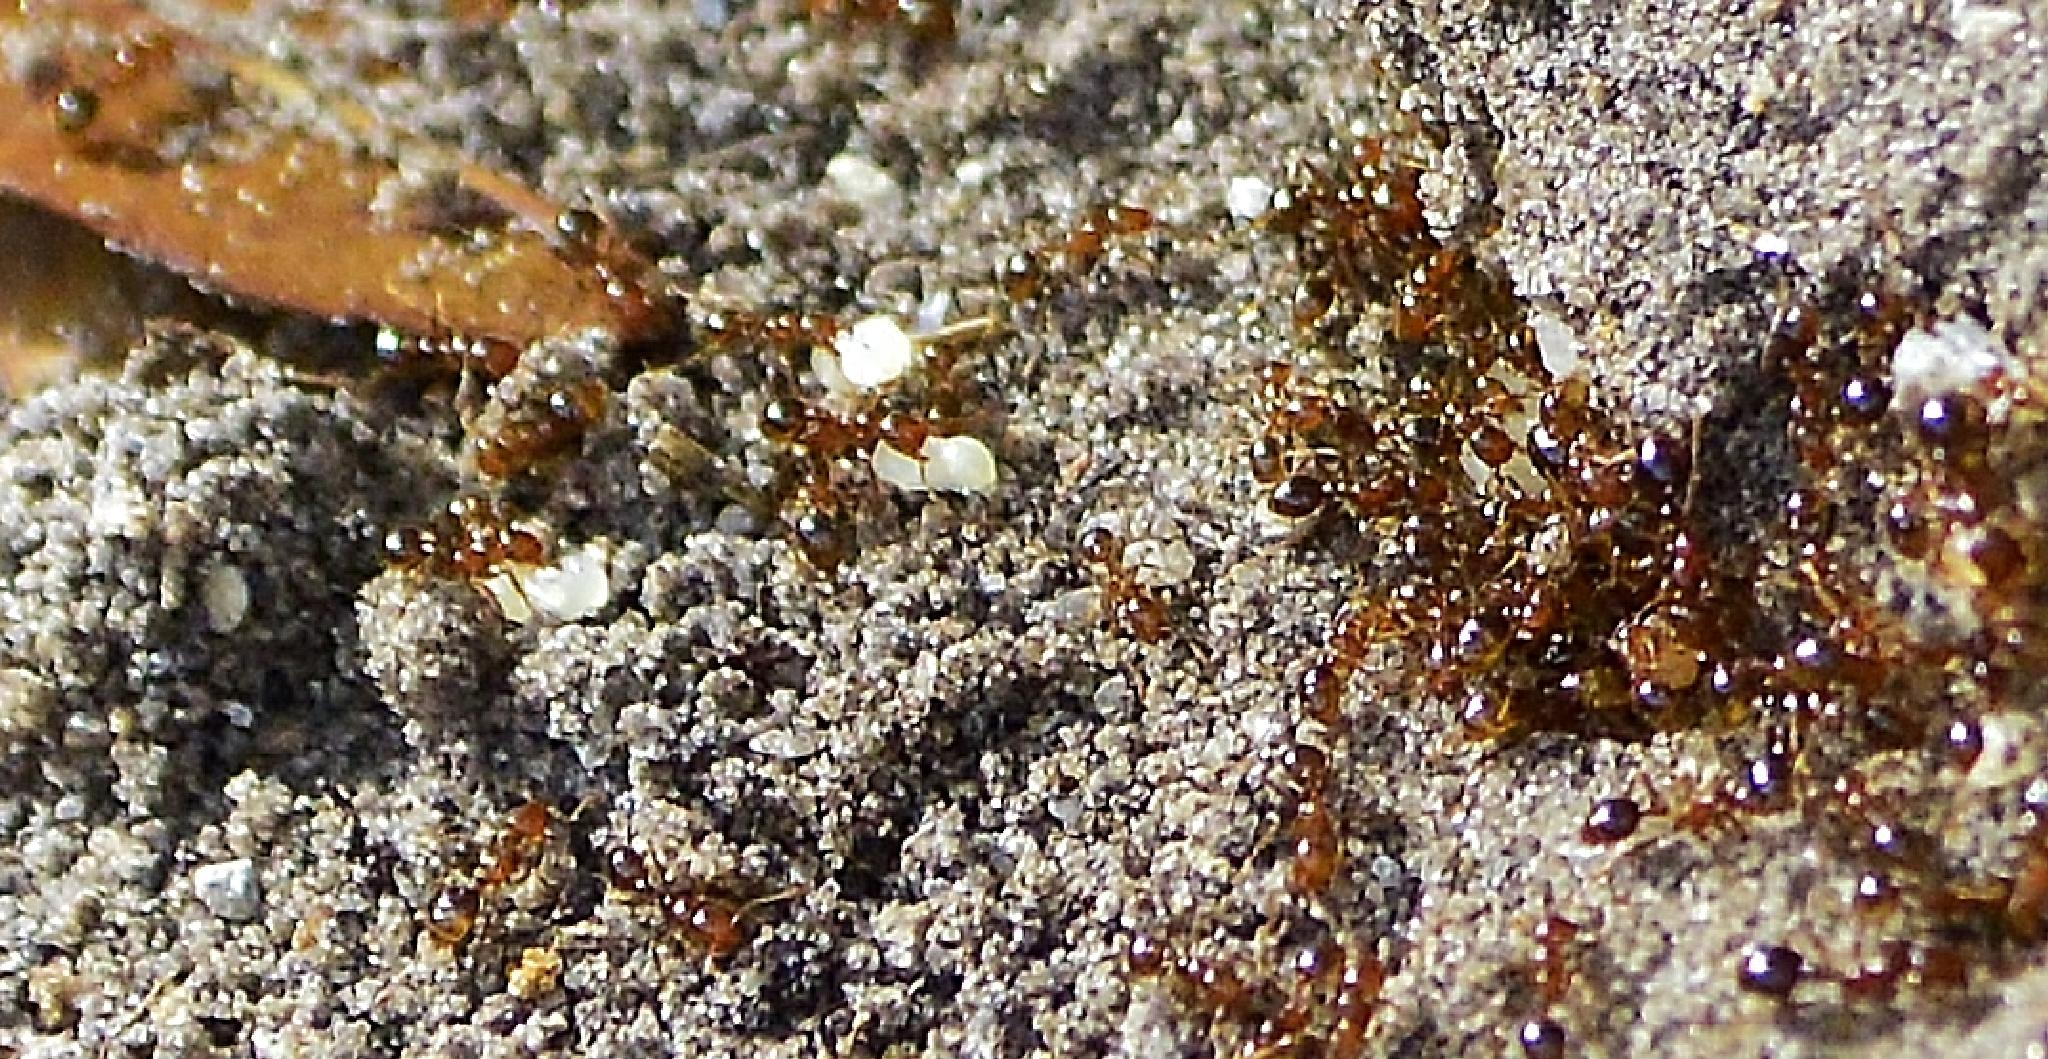 Fire Ants by jamie.dorton